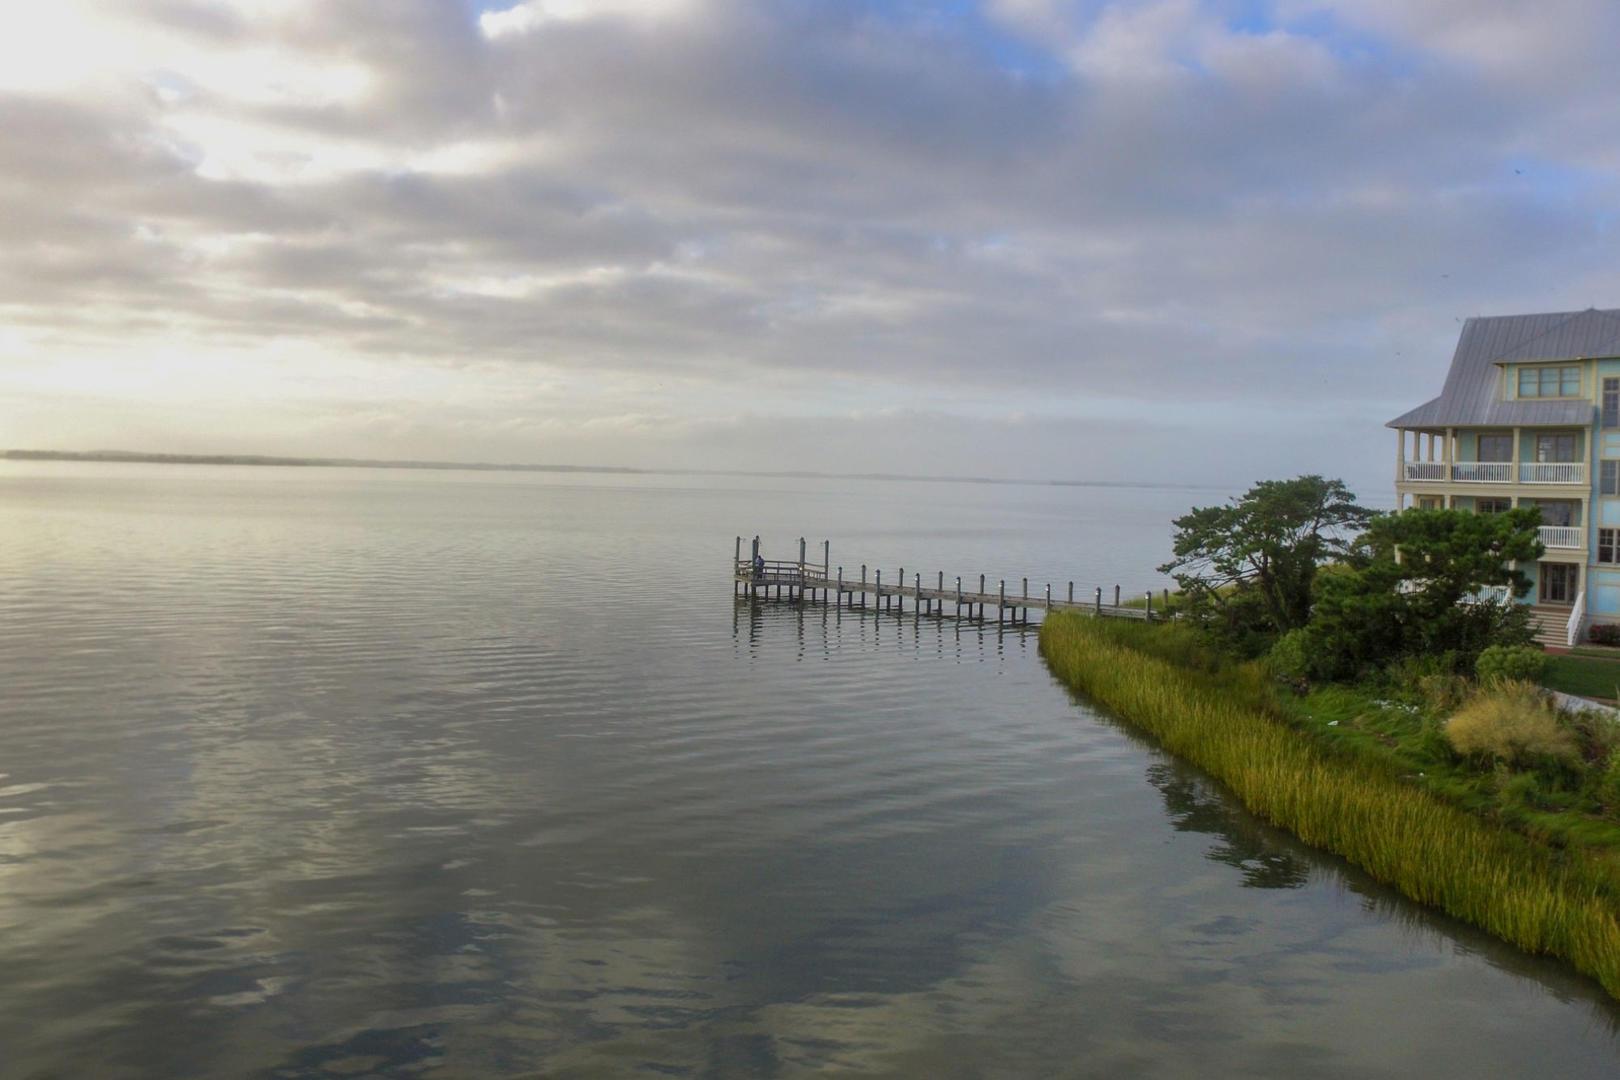 Sunset Island Fishing and Crabbing Pier